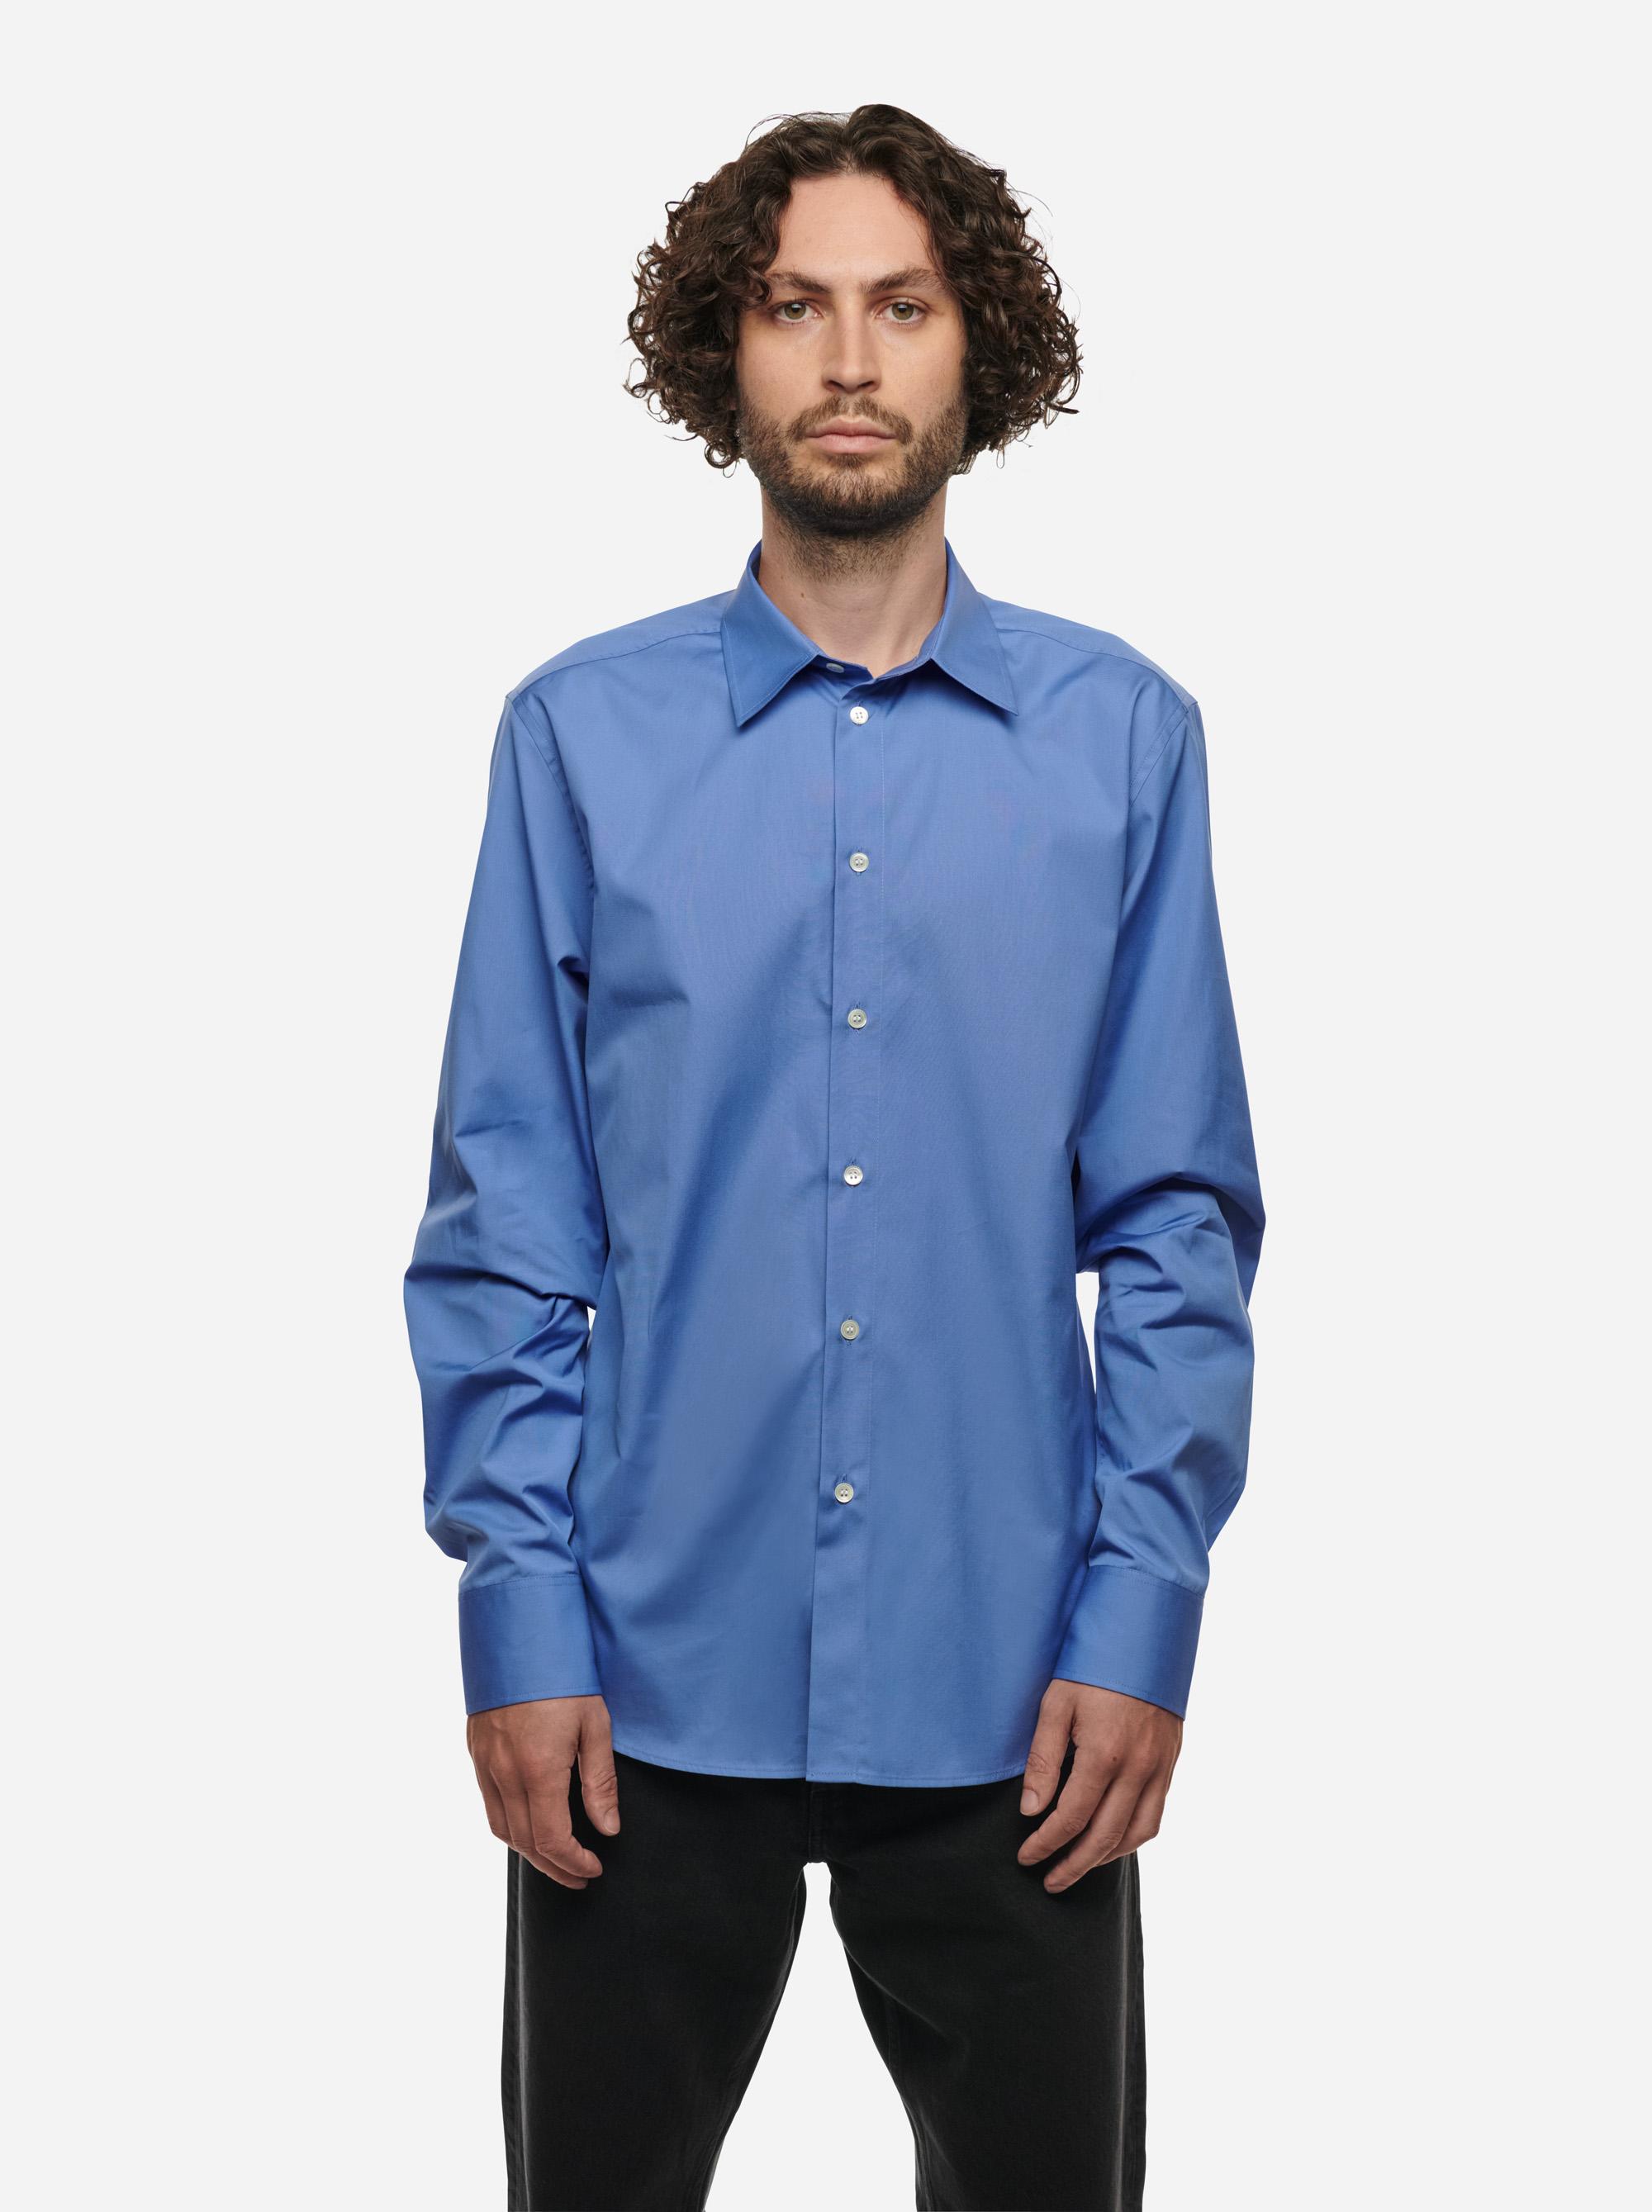 Teym - The Shirt - Men - Blue - 1